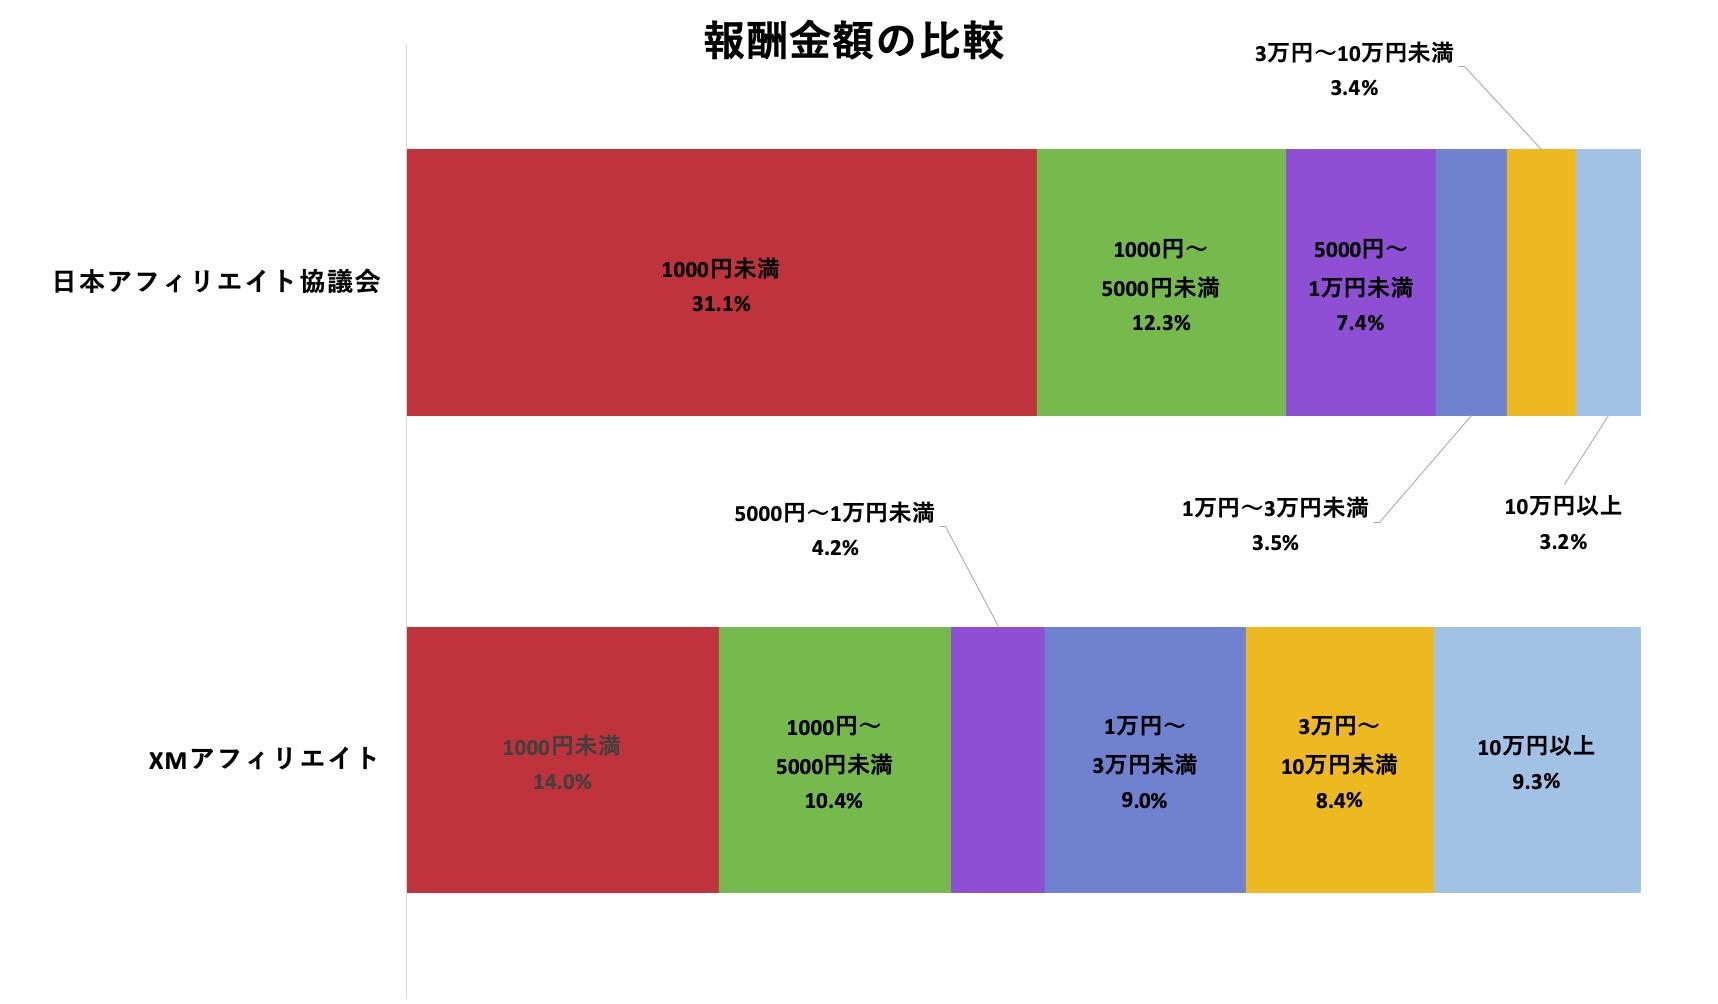 XMアフィリエイトとの報酬の比較